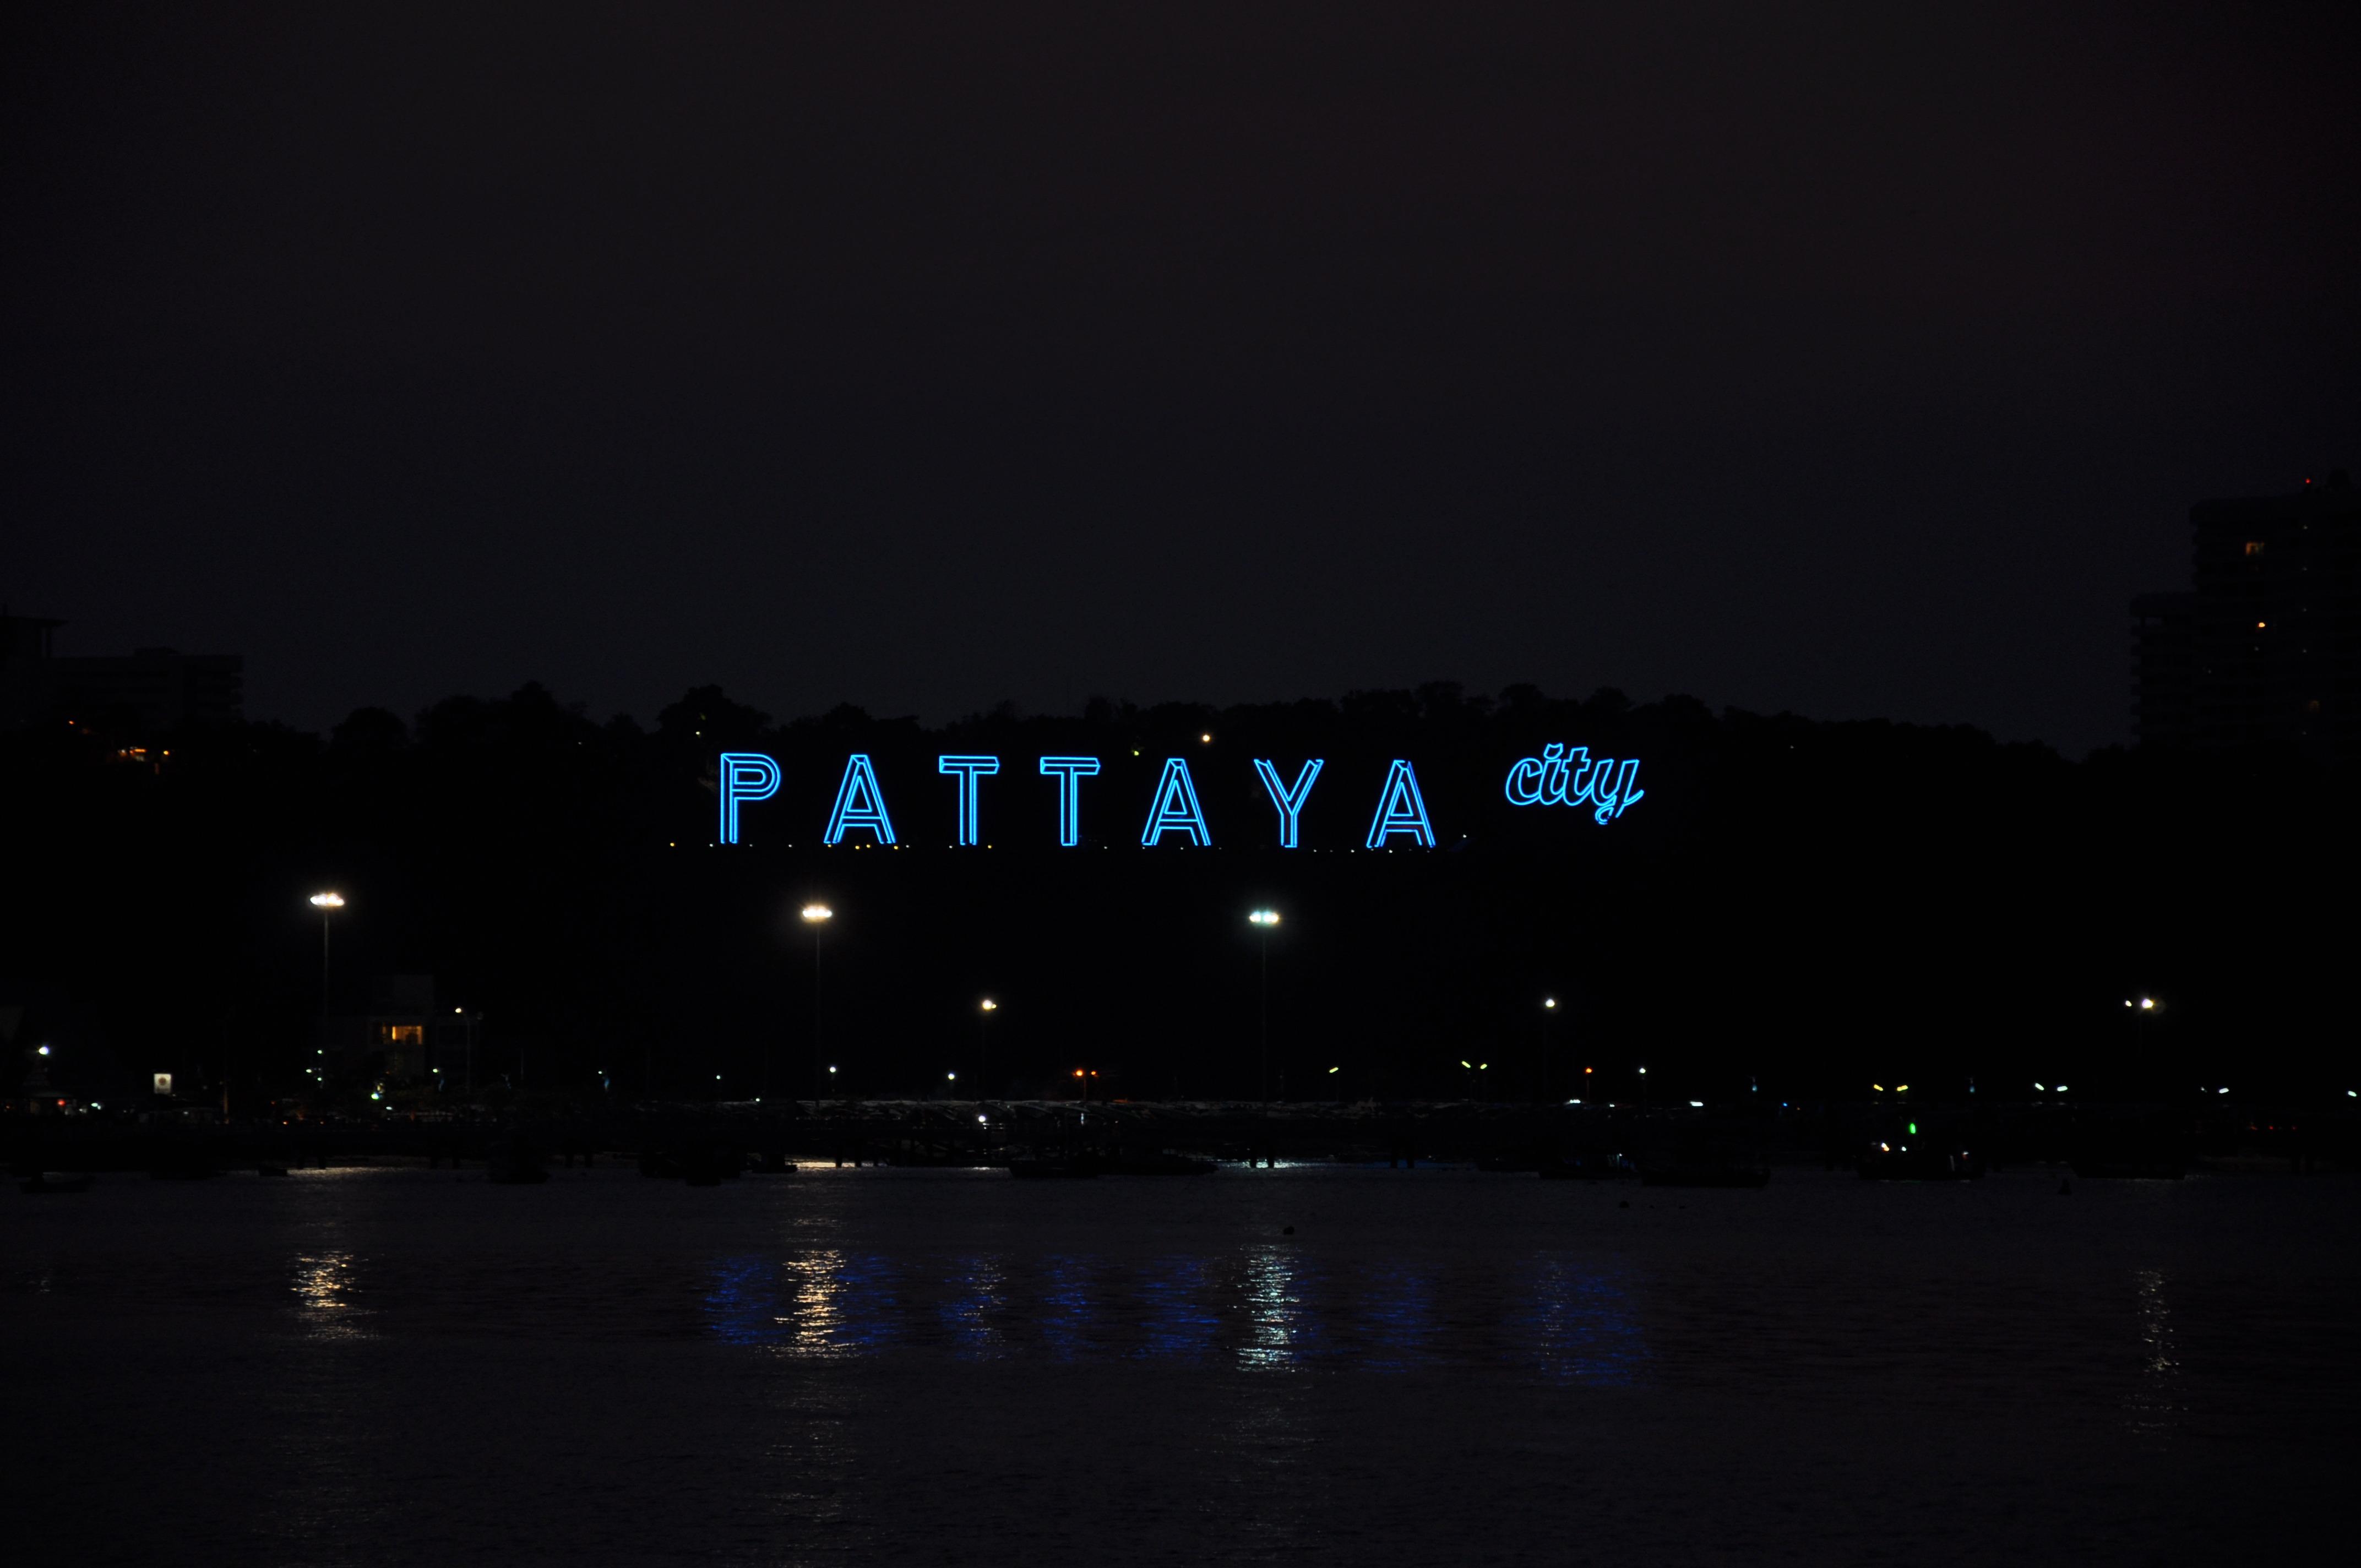 pattaya city sign lit up at night